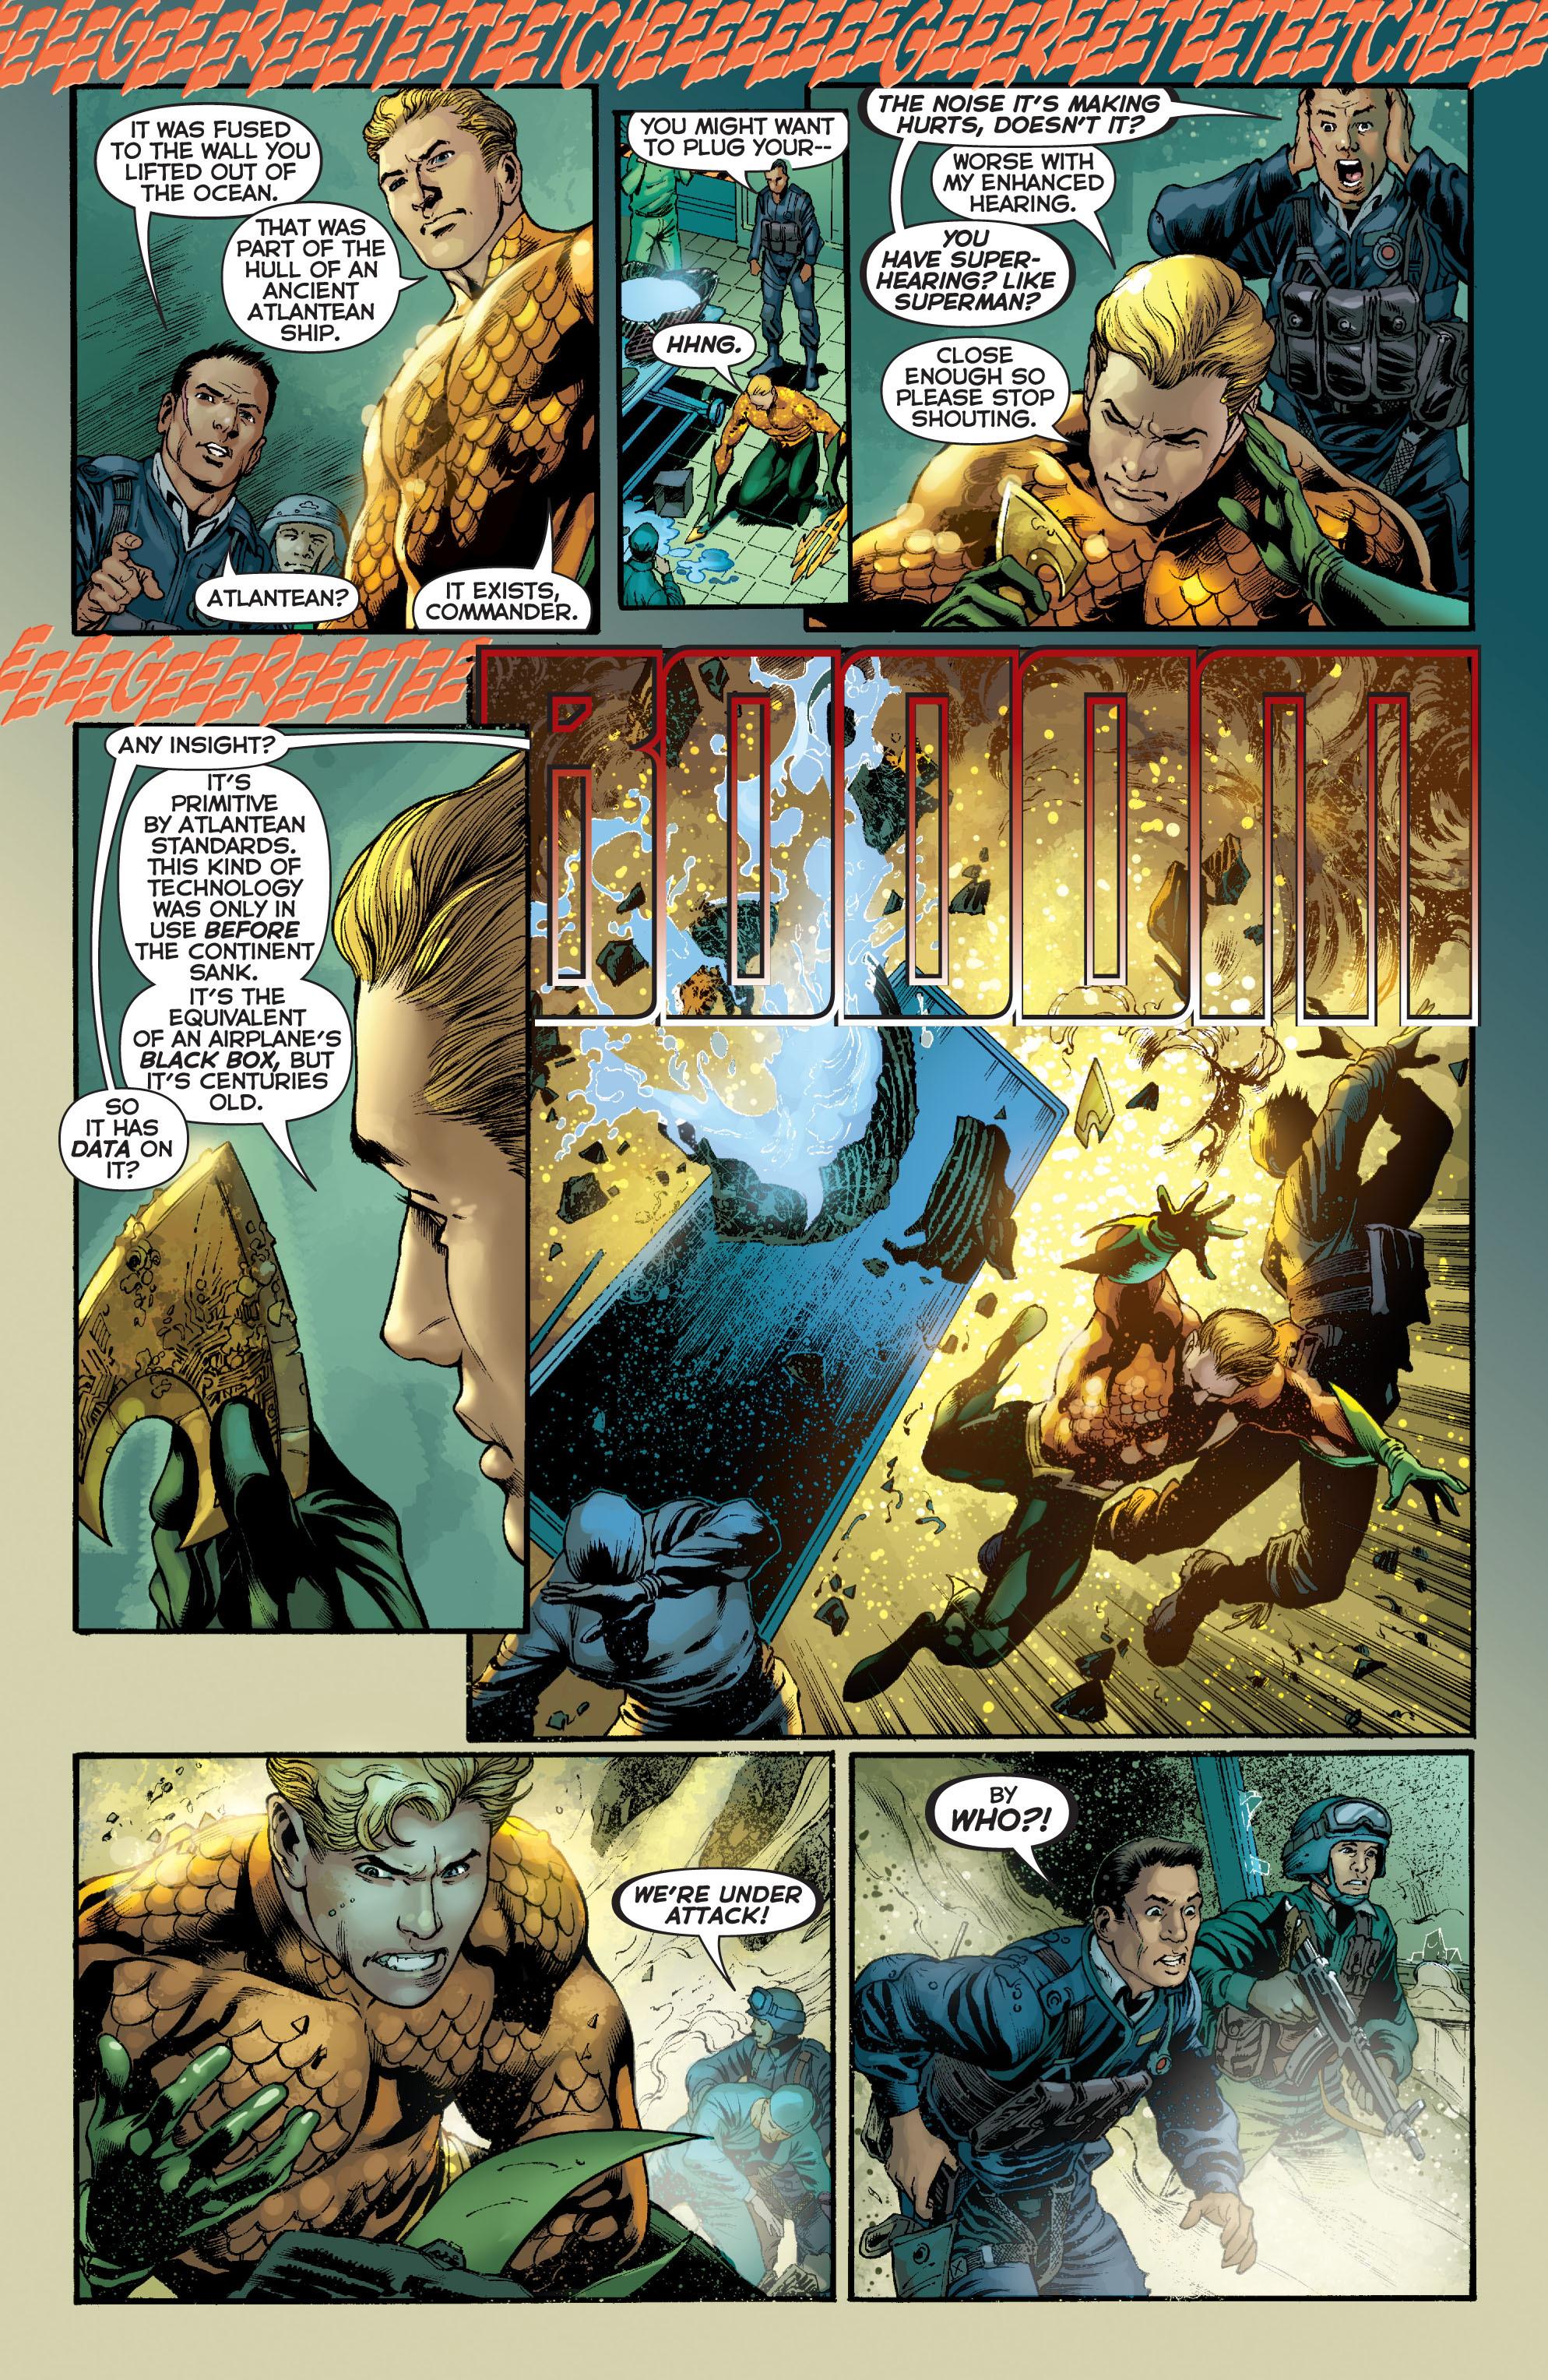 Read online Aquaman (2011) comic -  Issue #5 - 10